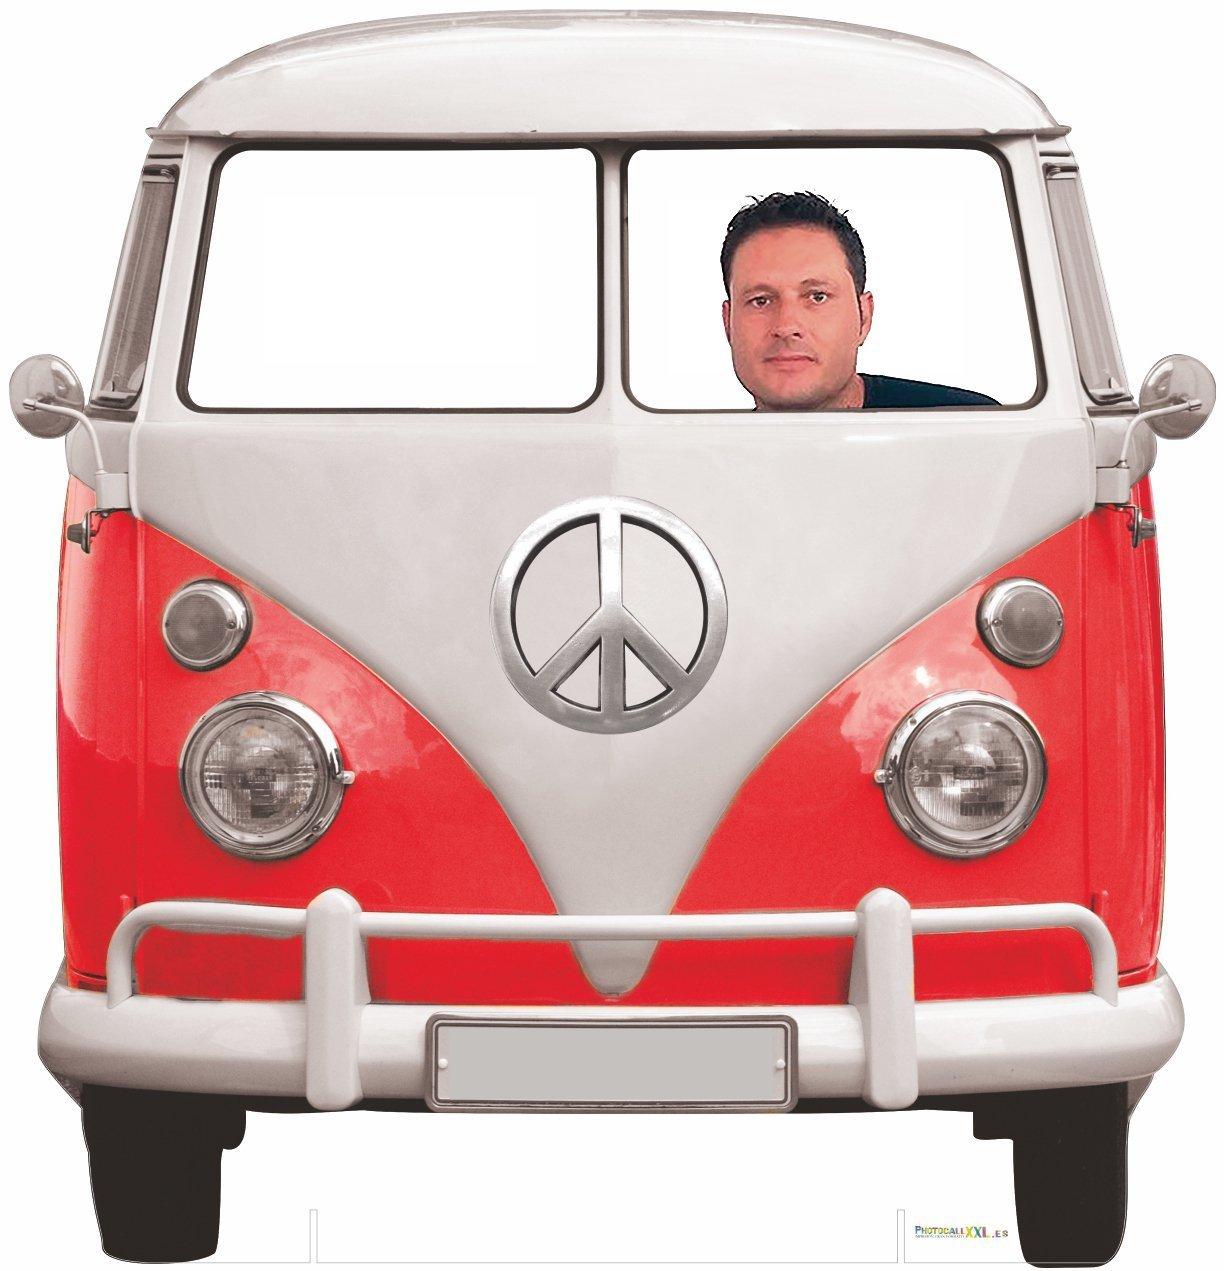 Photocall Coche Volkswagen Hippie 1,50x1,50cm | Photocall Divertido para Bodas, Cumpleaños, Eventos... | Photocall Furgoneta Volkswagen Resistente, ...